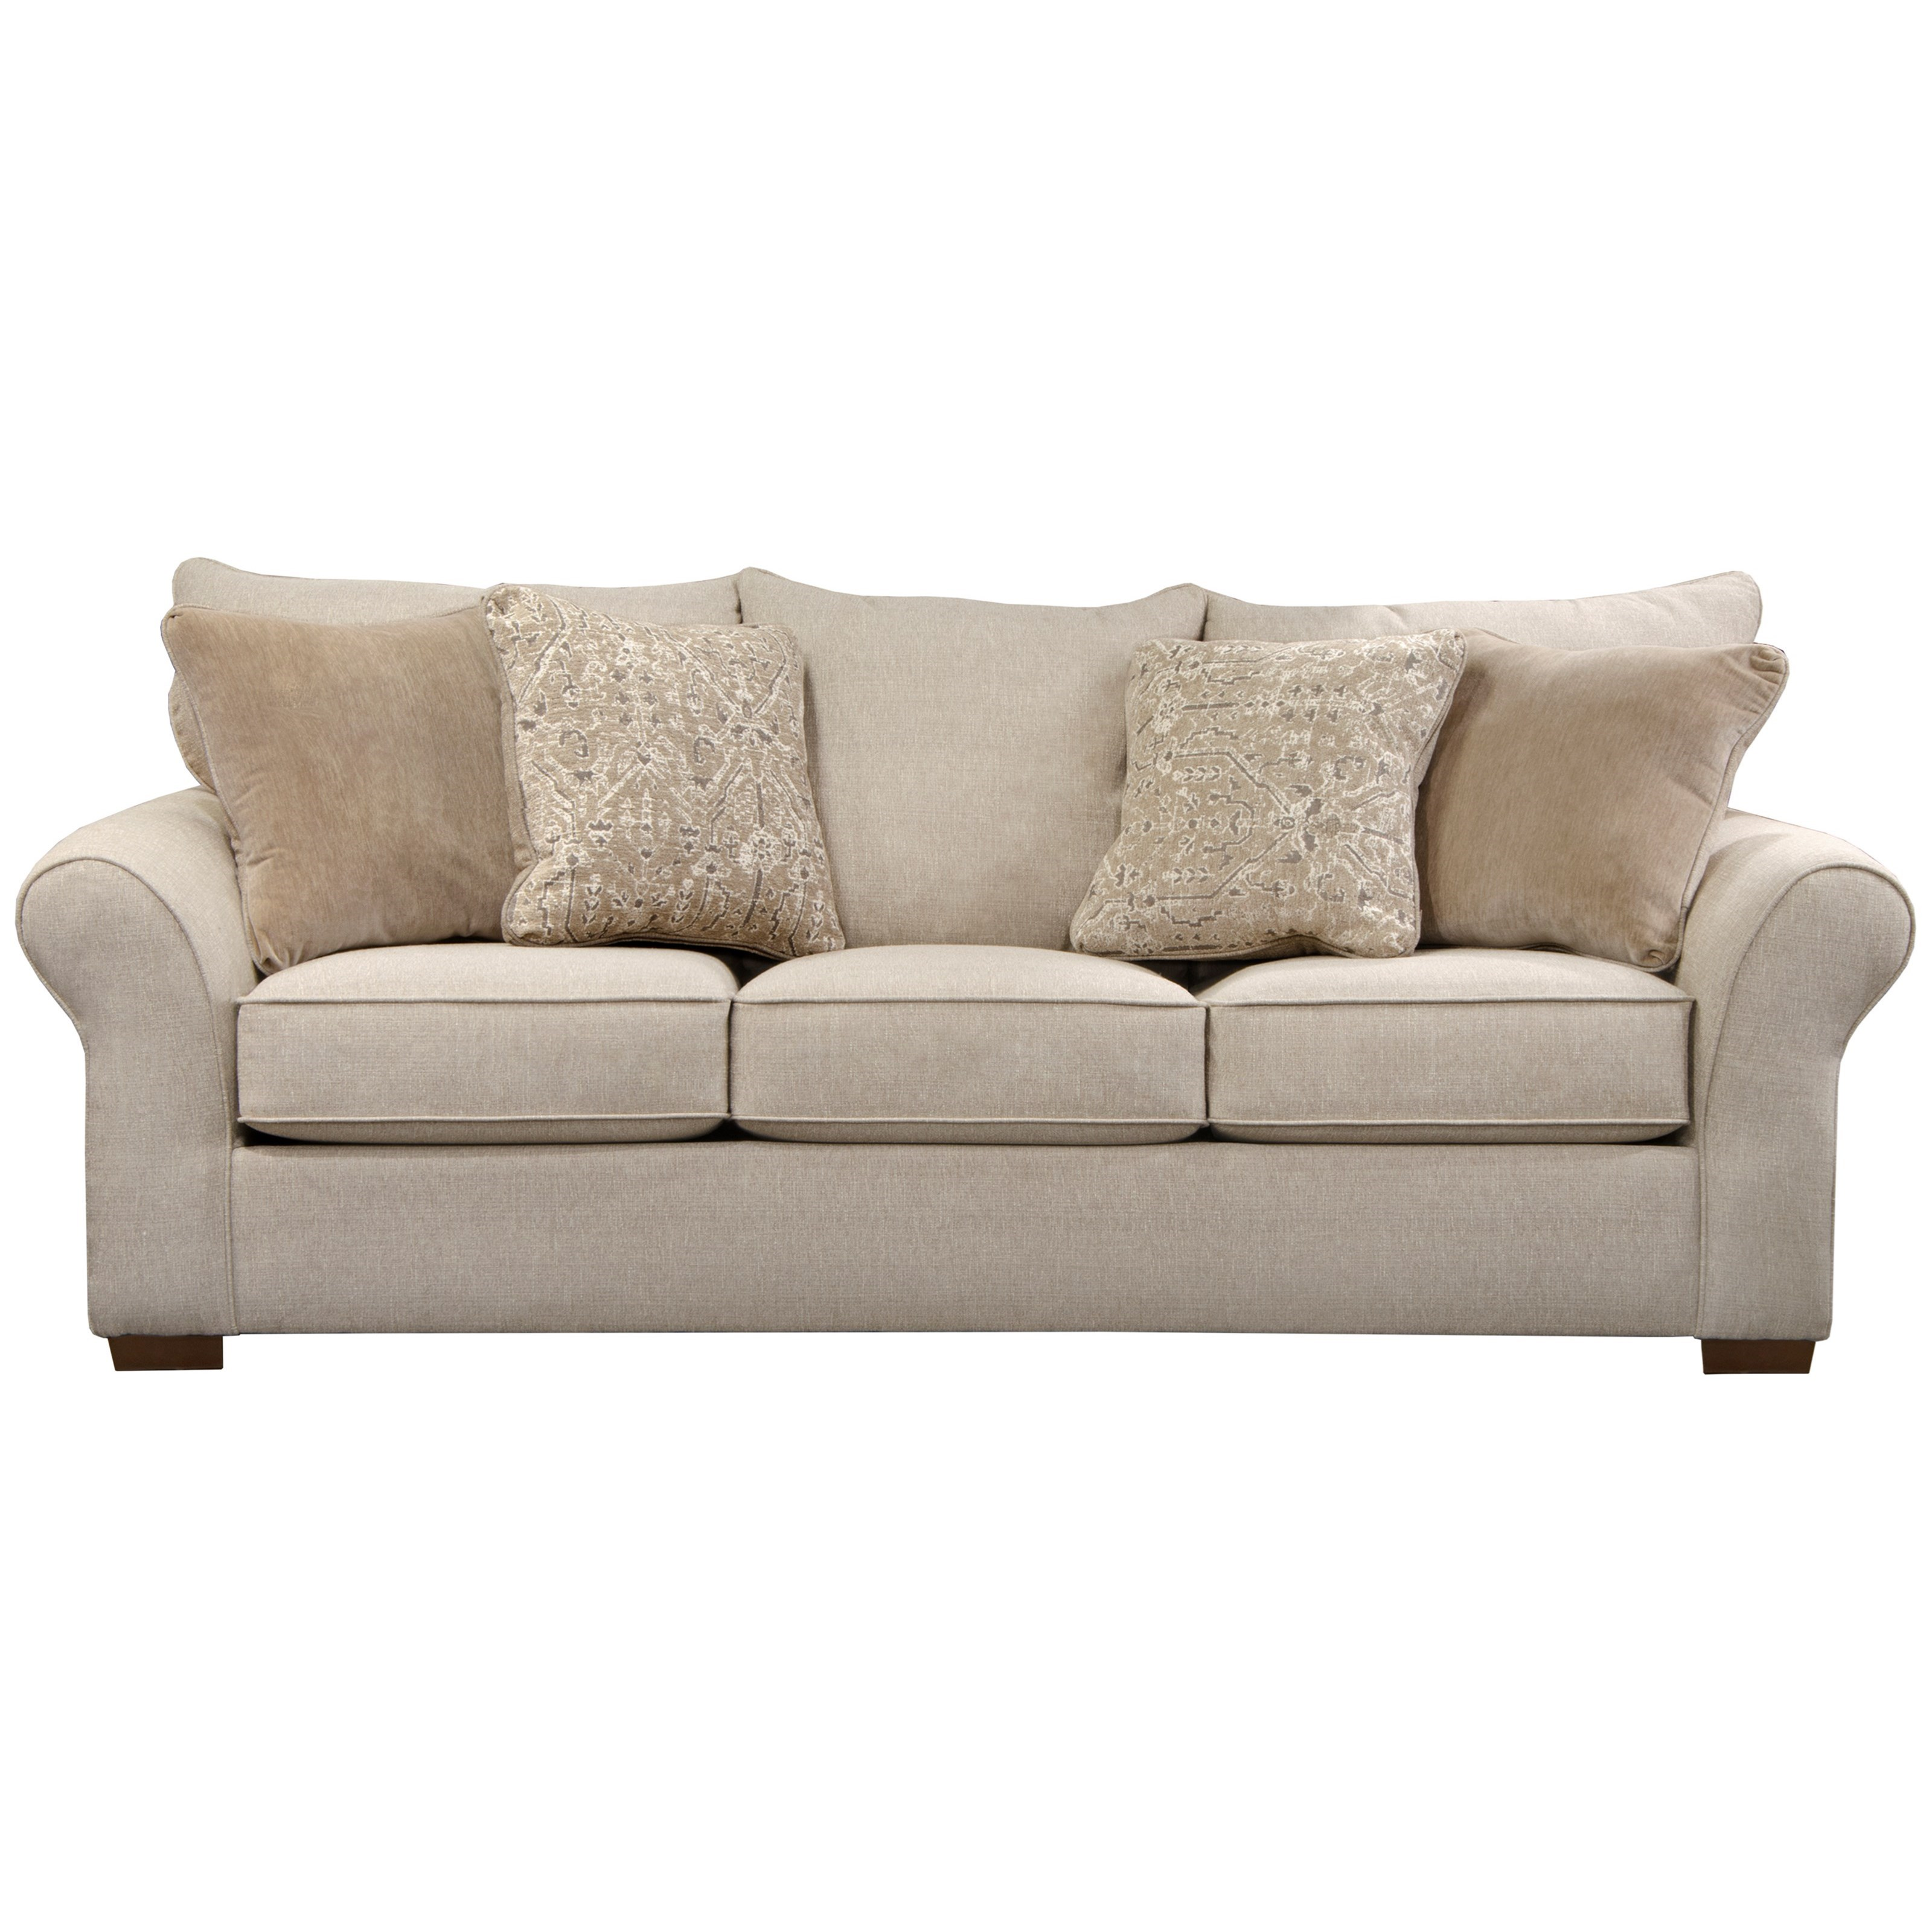 Maddox Sofa by Jackson Furniture at Zak's Warehouse Clearance Center